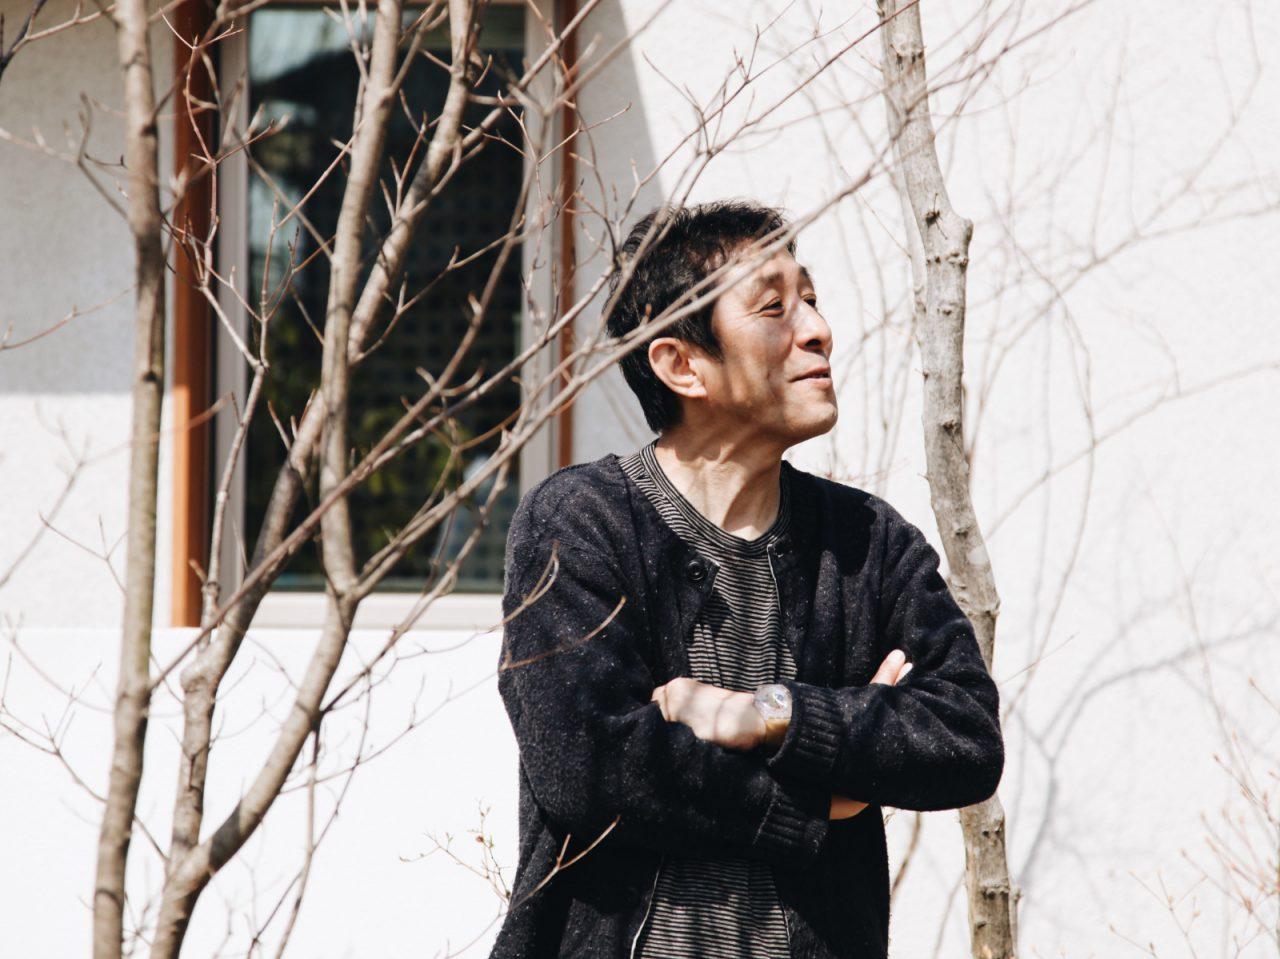 ■ Profile.  小泉誠 家具デザイナー  家具デザイナーの小泉誠は、木工技術を習得した後、1990年Koizumi Studio設立。2003年にはデザインを伝える場として「こいずみ道具店」を開設。建築から箸置きまで生活に関わる全てのデザインに関わり、現在は日本全国のものづくりの現場を駆け回り地域との協働を続けている。2005年より武蔵野美術大学空間演出デザイン学科教授。2012年毎日デザイン賞受賞。2015年より一般社団法人わざわ座 代表理事。2016年日本クラフト展大賞。